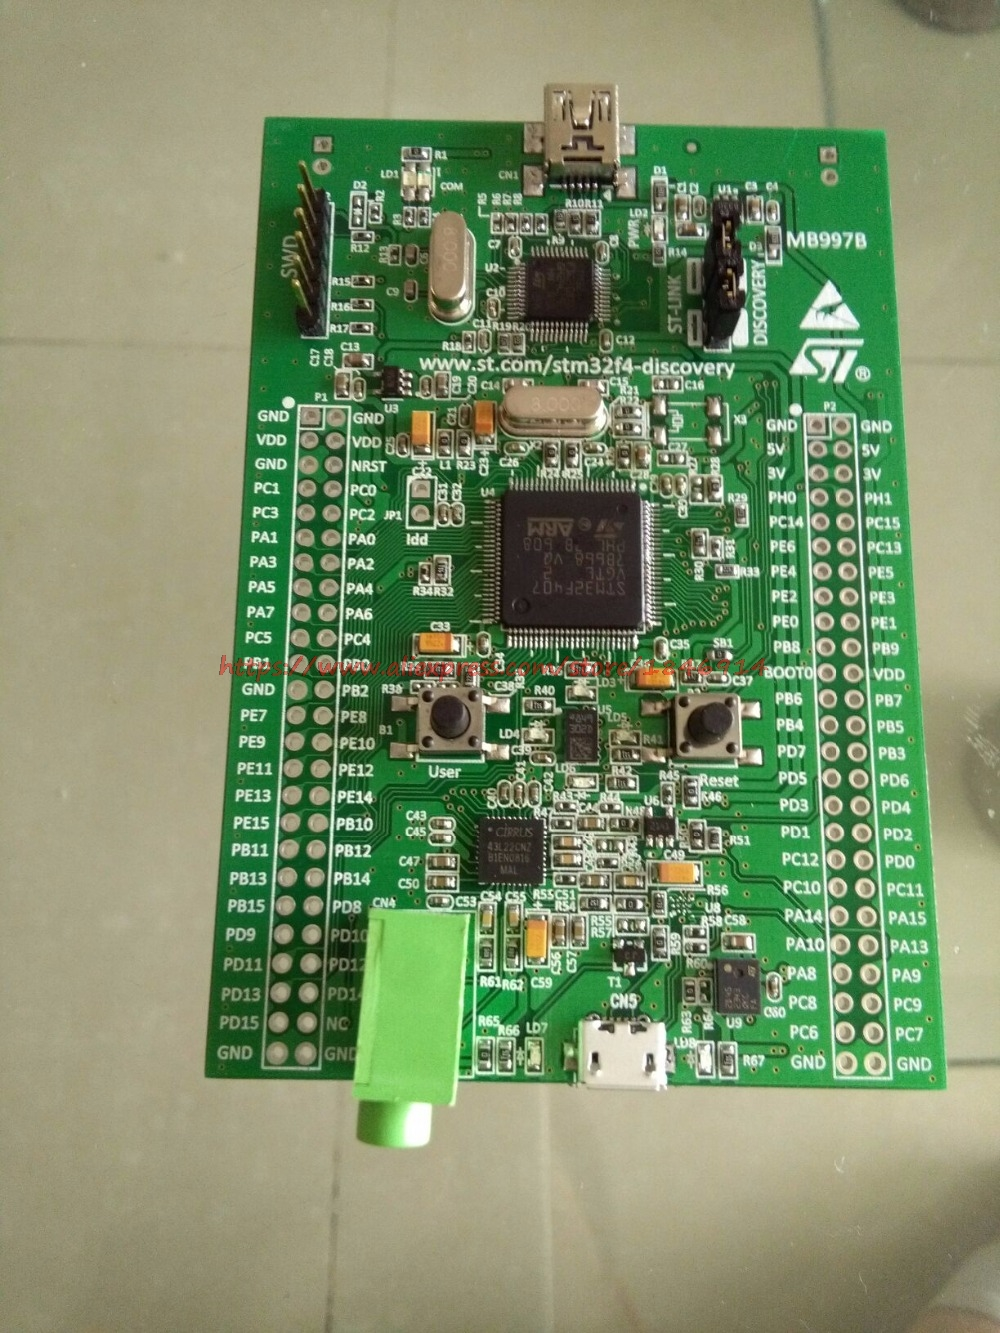 Free shipping 100% Original STM32 Discovery Board Stm32f4discovery Stm32f4 kit Cortex-m4 STM32 Development Board St-link v2